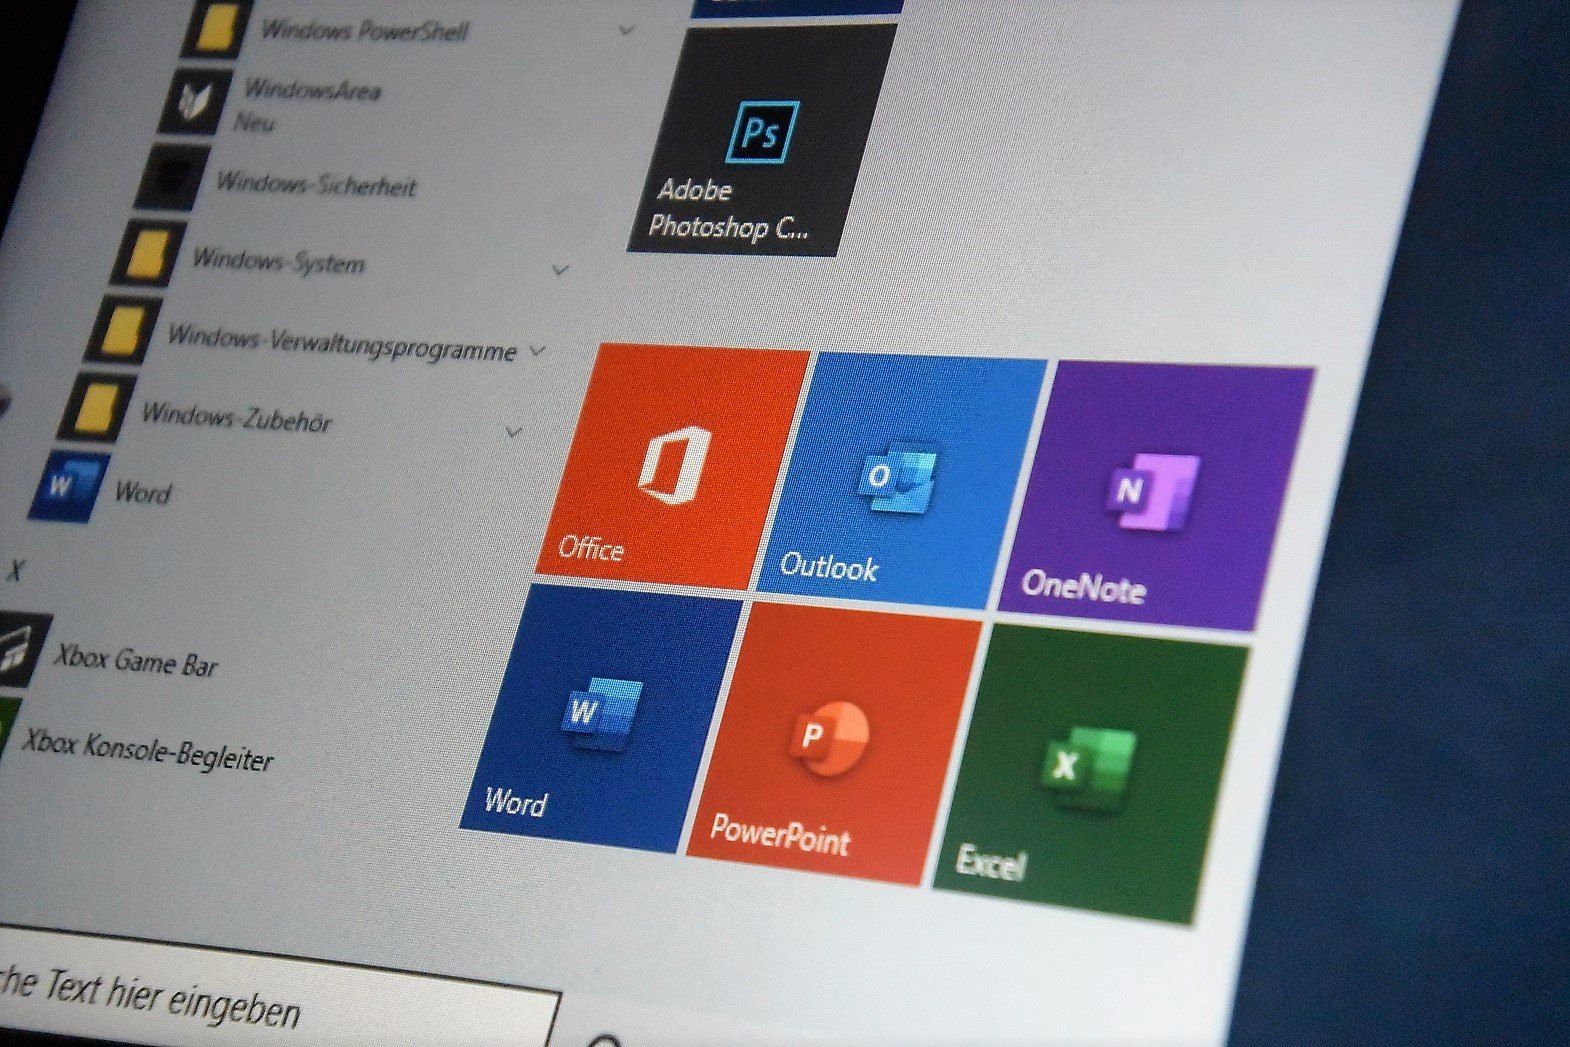 Microsoft Office Live-Kacheln im Windows 10 Startmenü